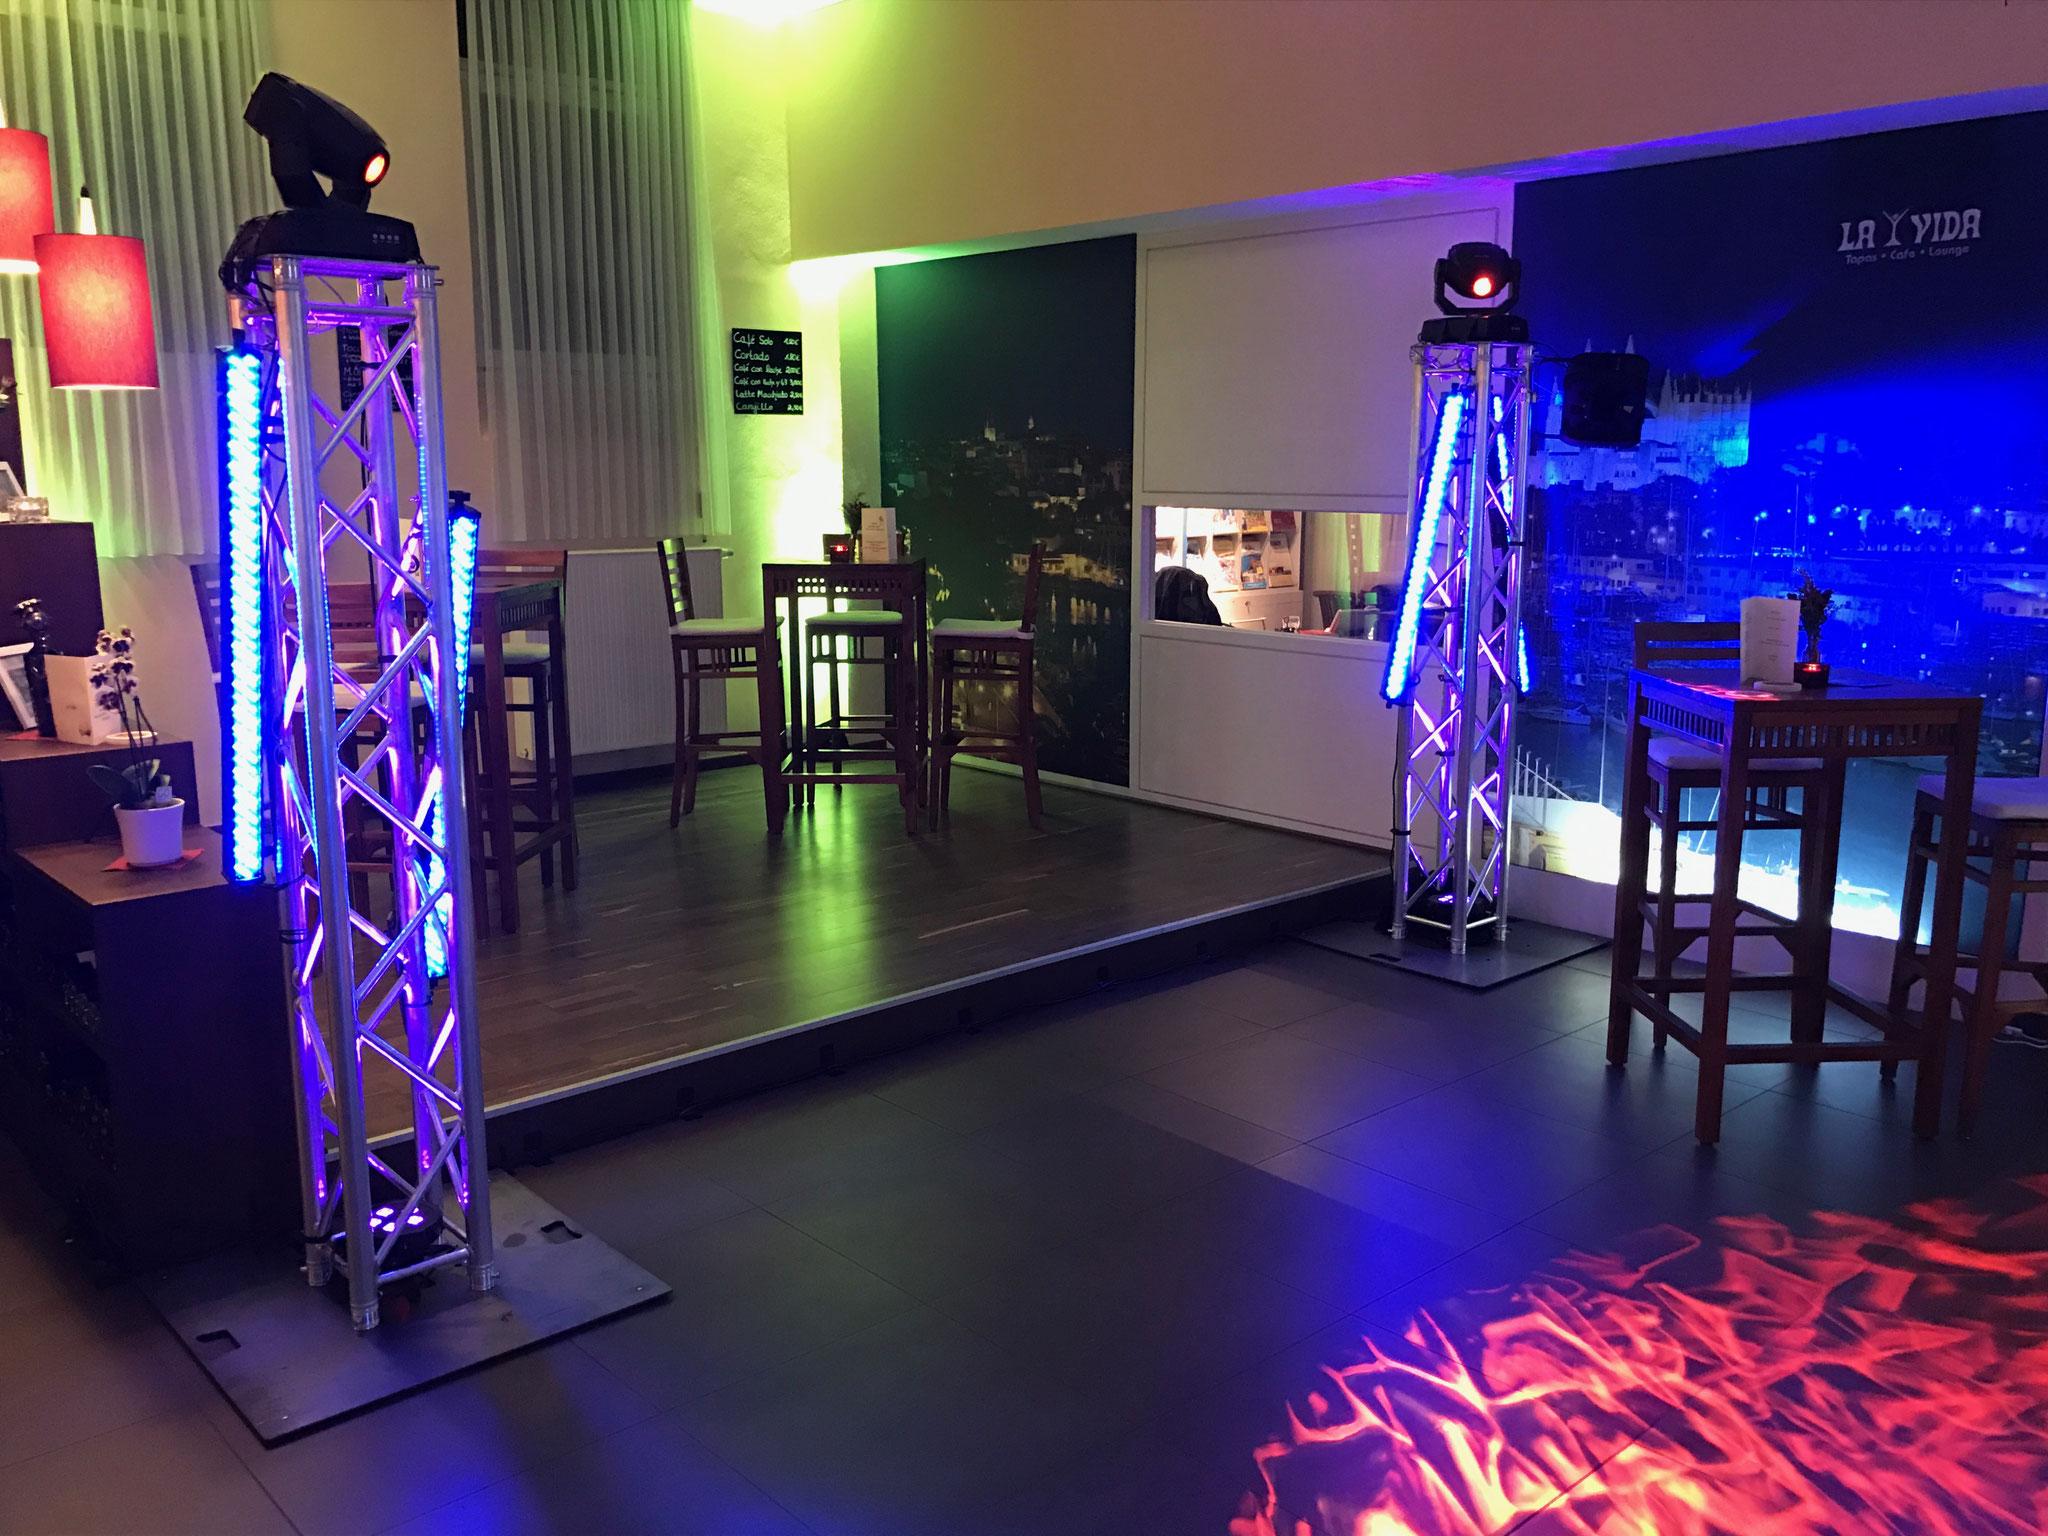 Tanzflächenbeleuchtung mit Moving Heads + LED Leisten